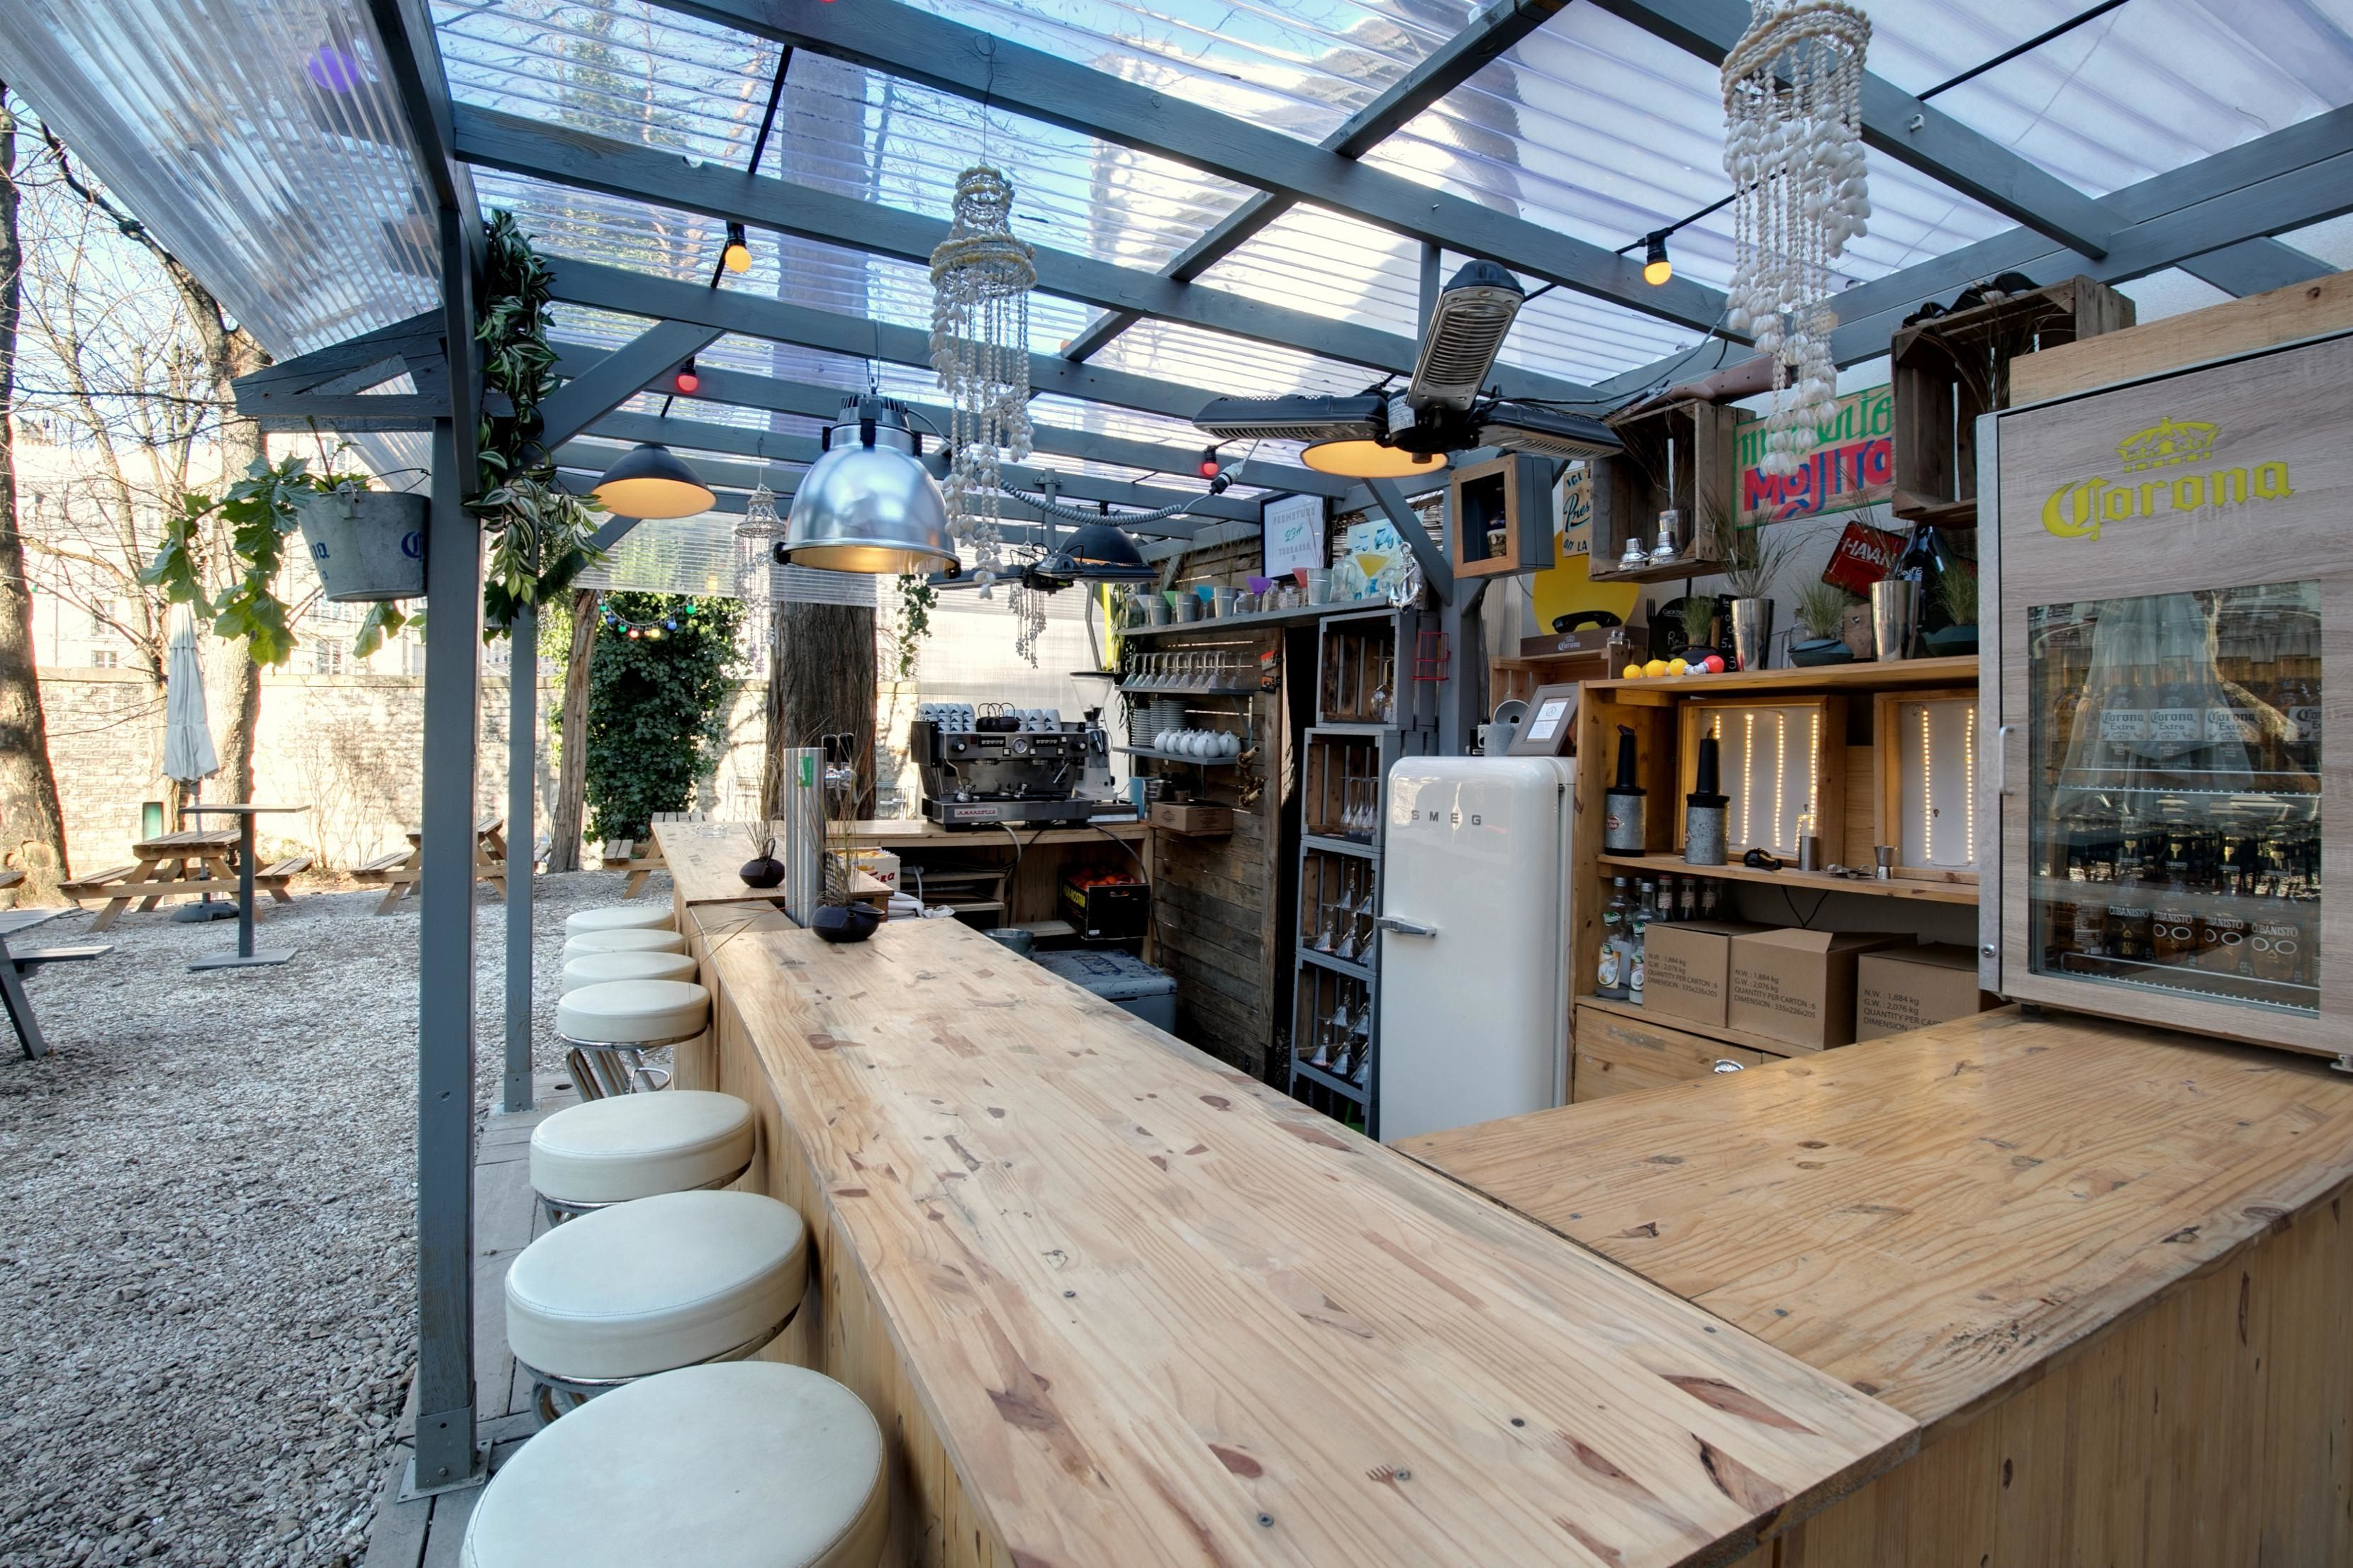 Terrasse Canal Saint Martin bar terrasse paris café a gare de l'est canal st martin